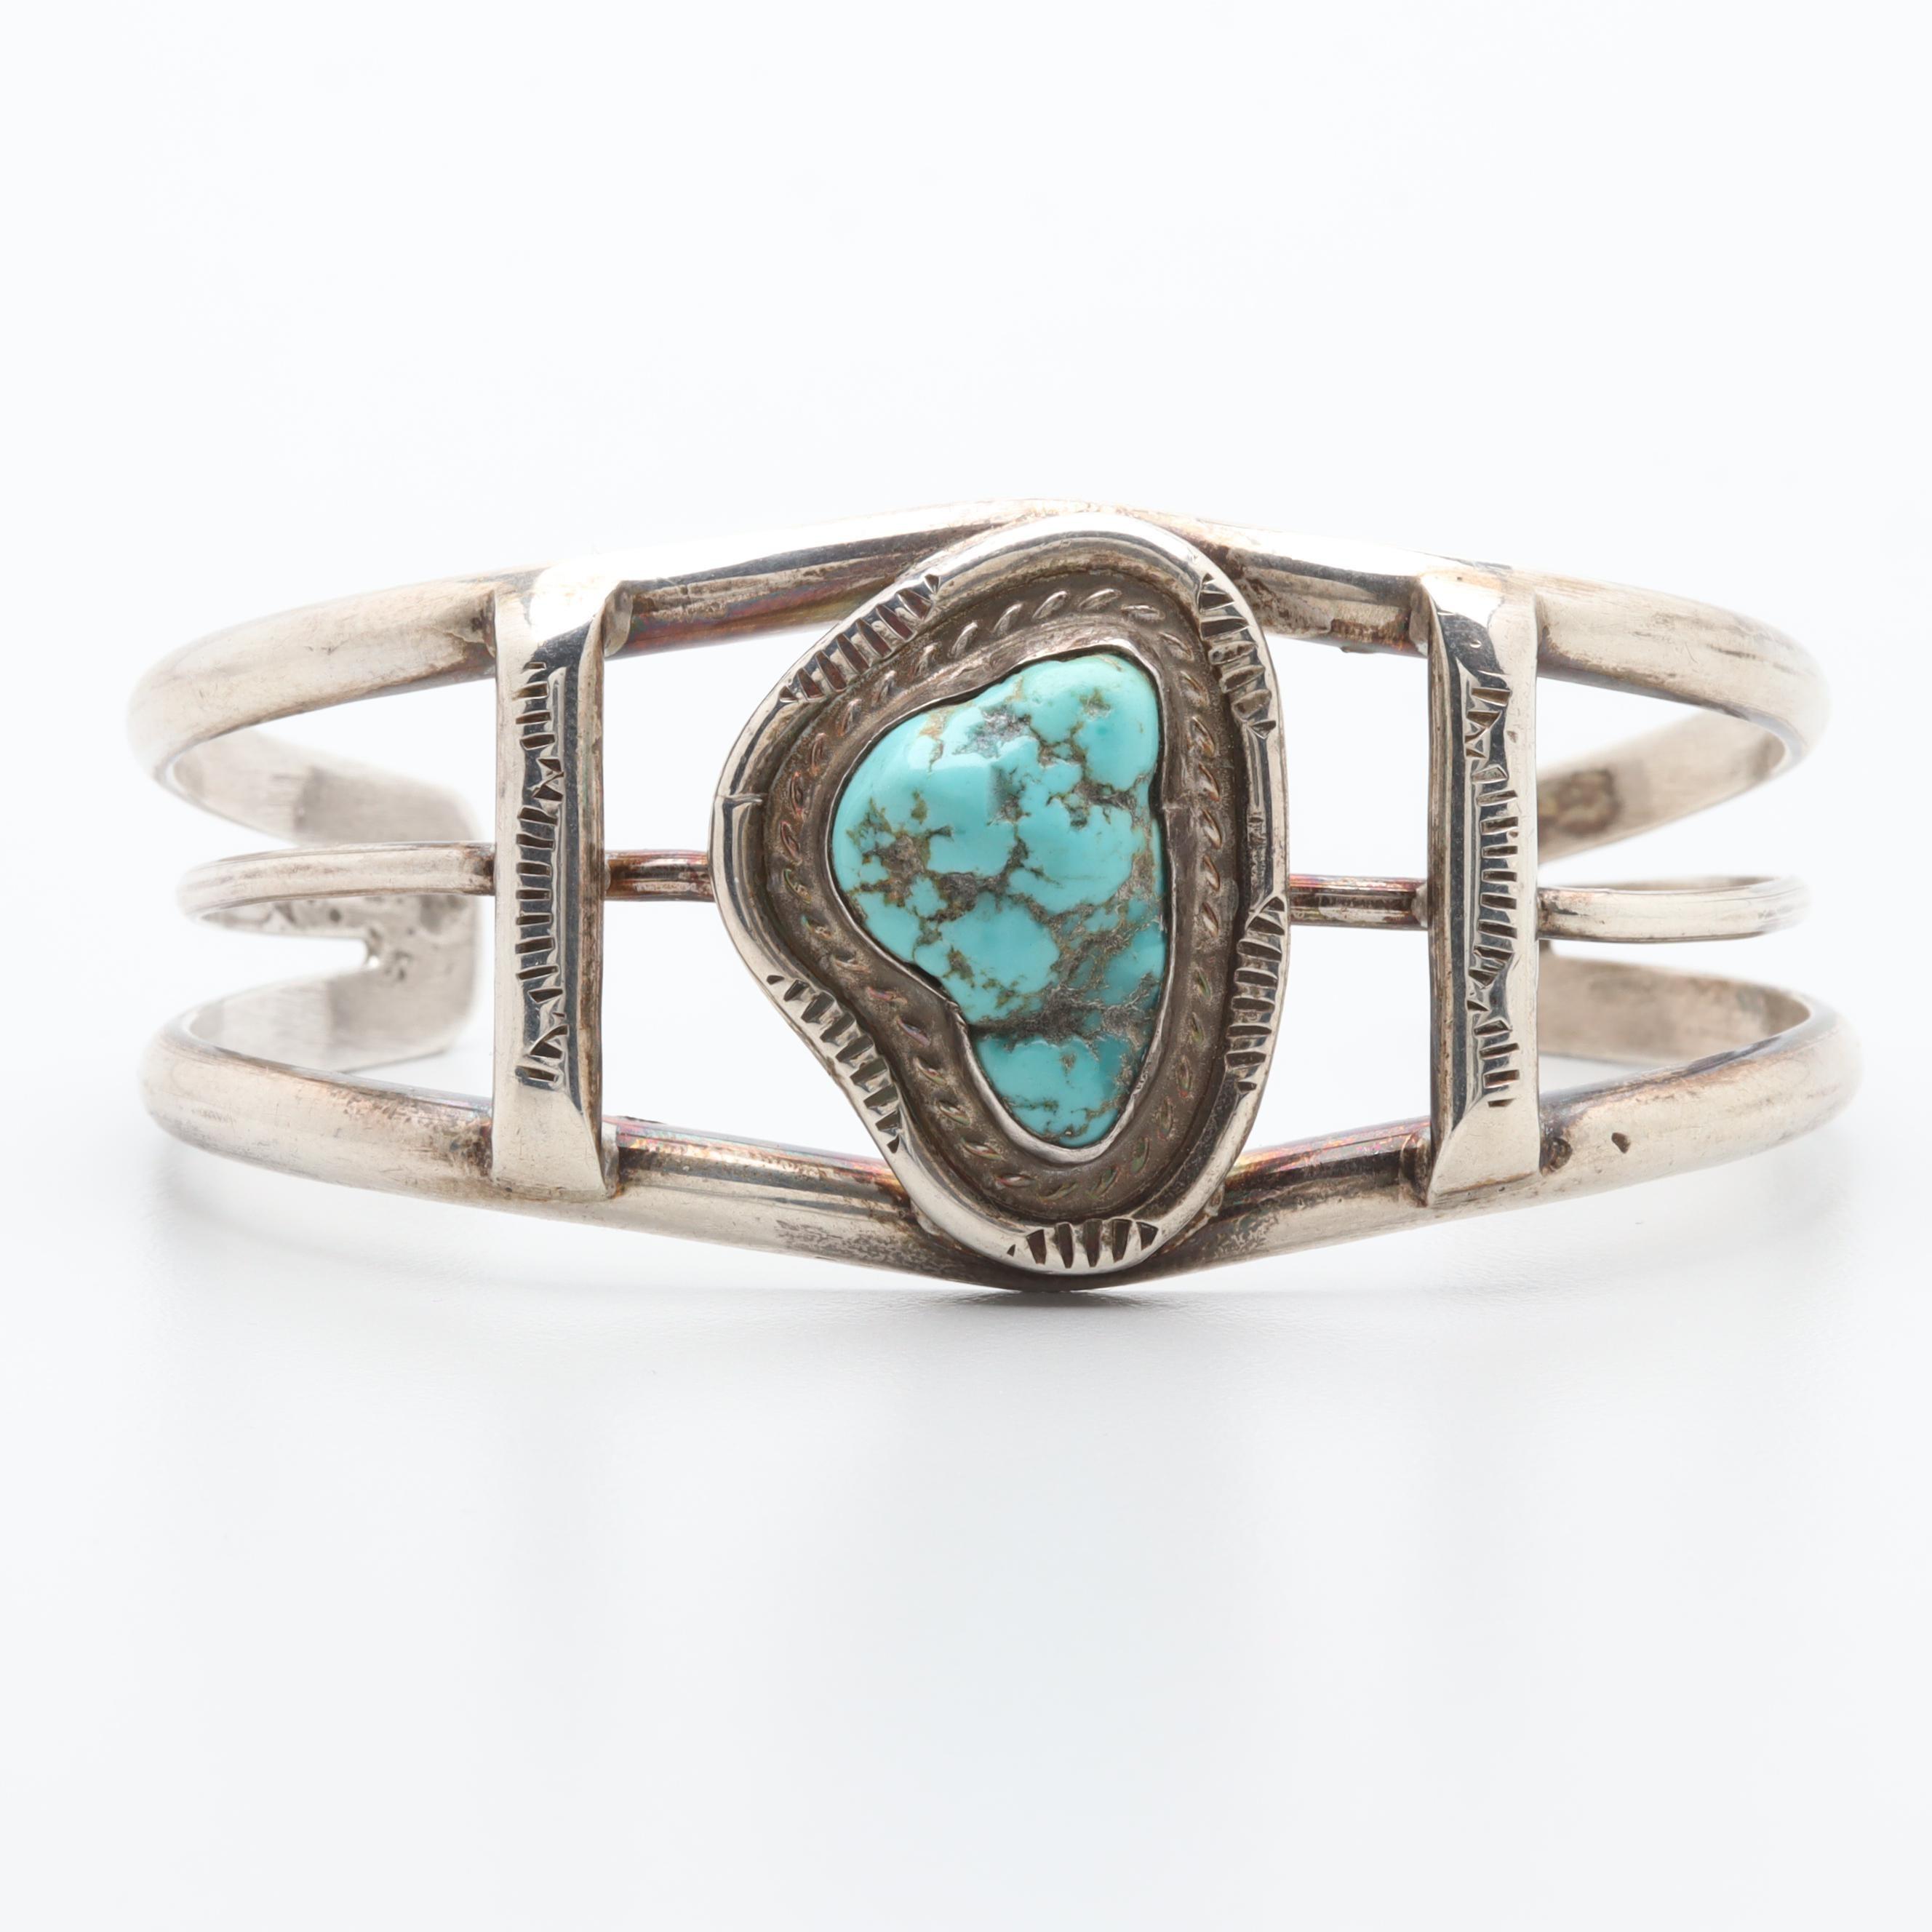 Southwestern Style Sterling Silver Turquoise Cuff Bracelet